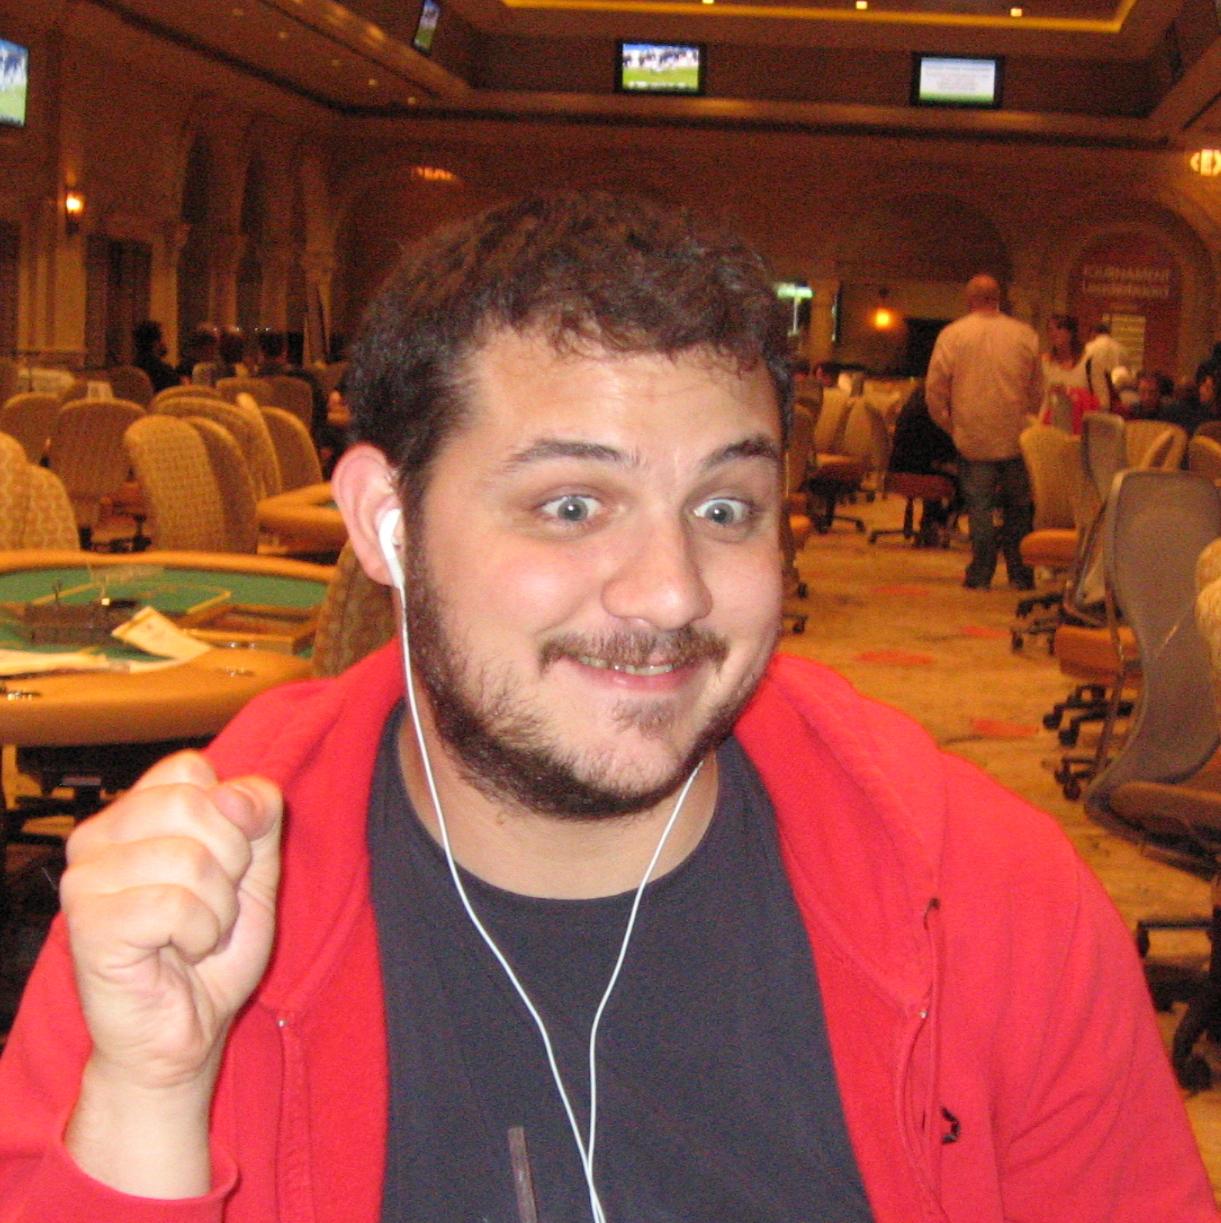 Borgata fall poker open 2012 11 11 12 for Peter ippolito